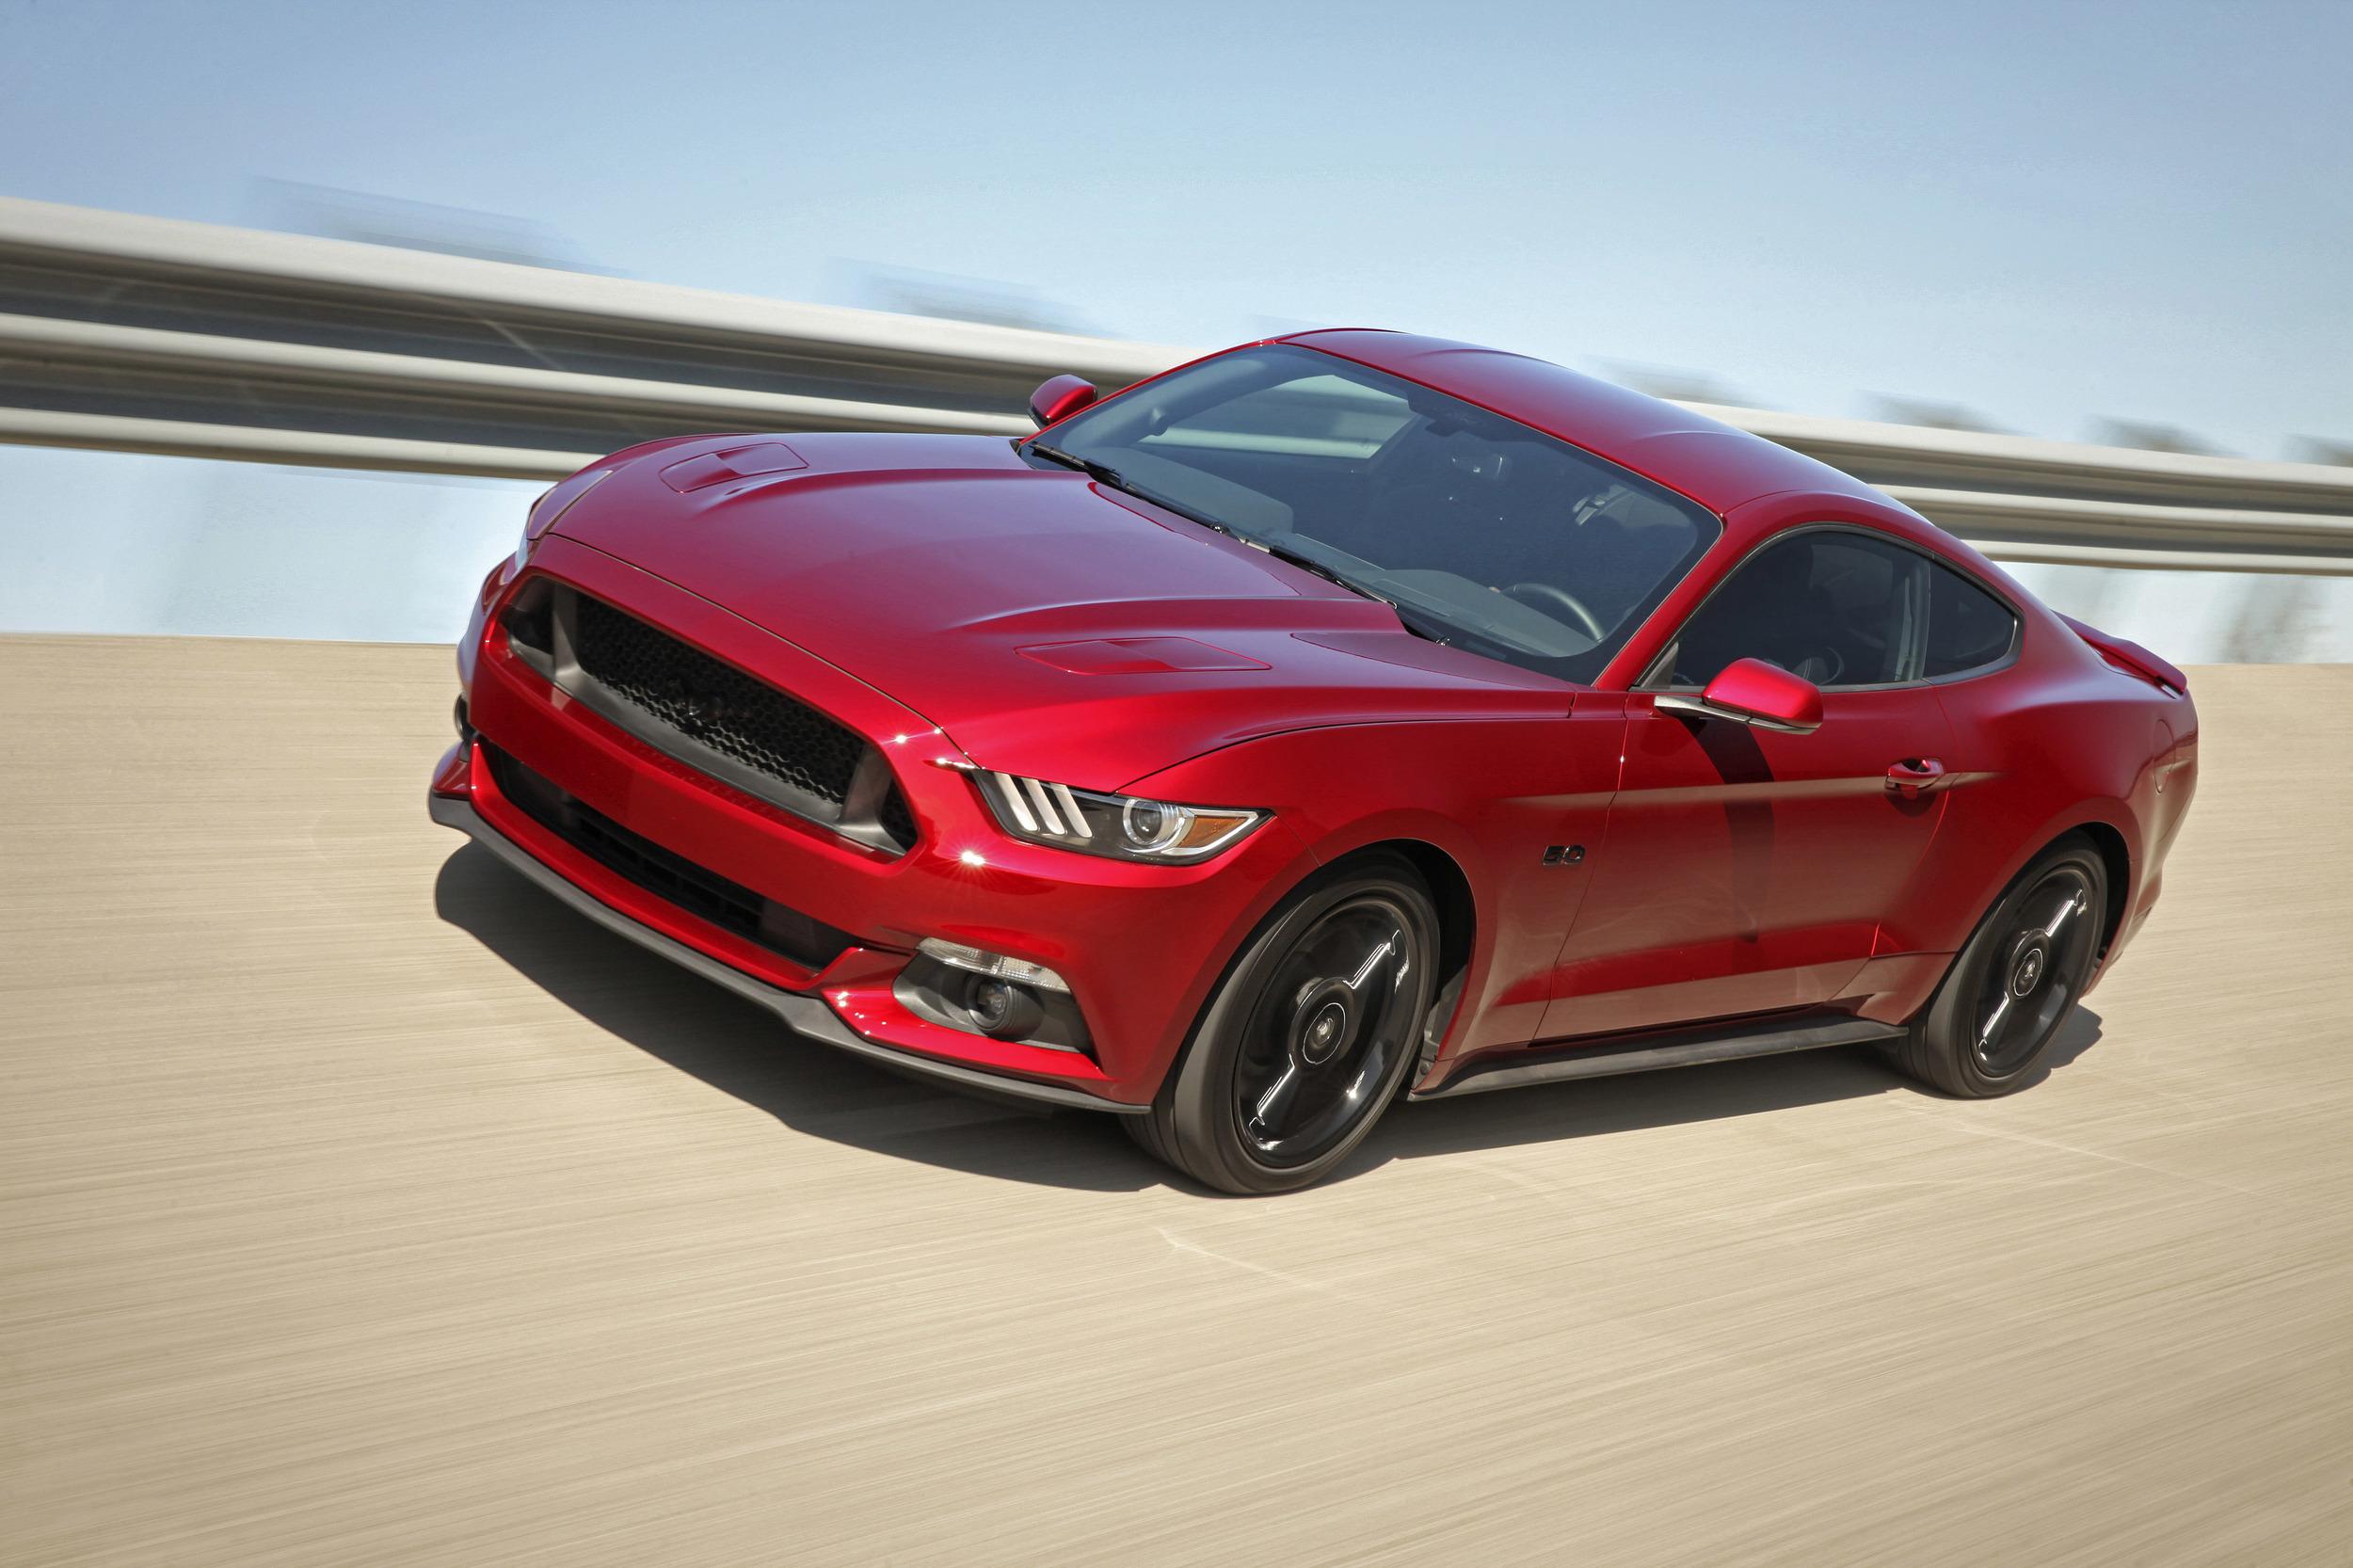 Mustang GT front